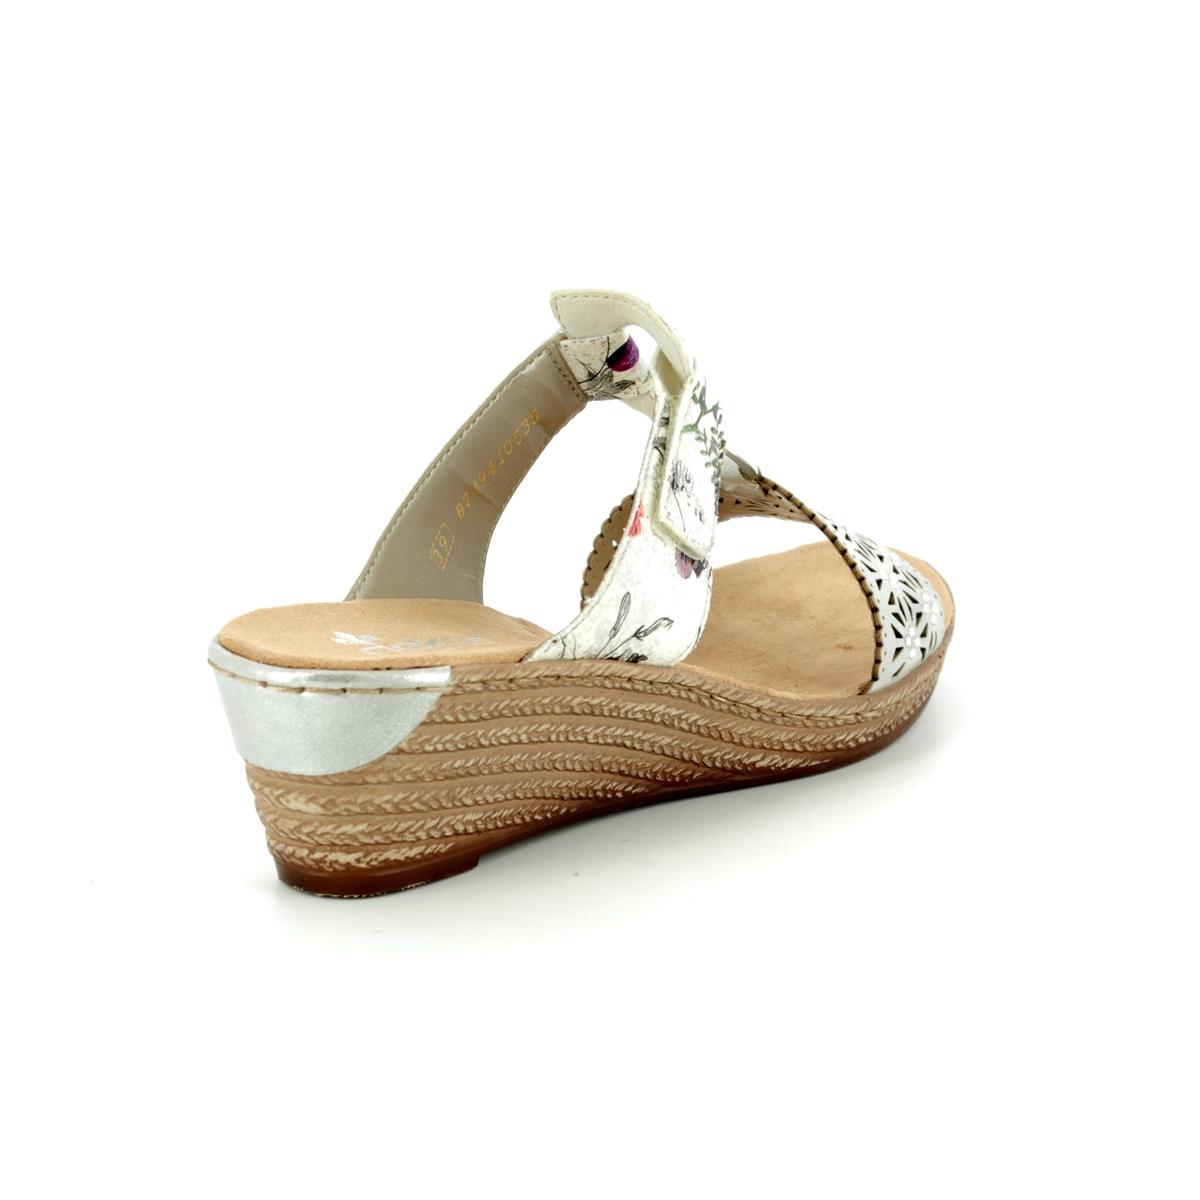 f39fd73d2 Rieker Wedge Sandals - Various - 62427-80 FAWMULE